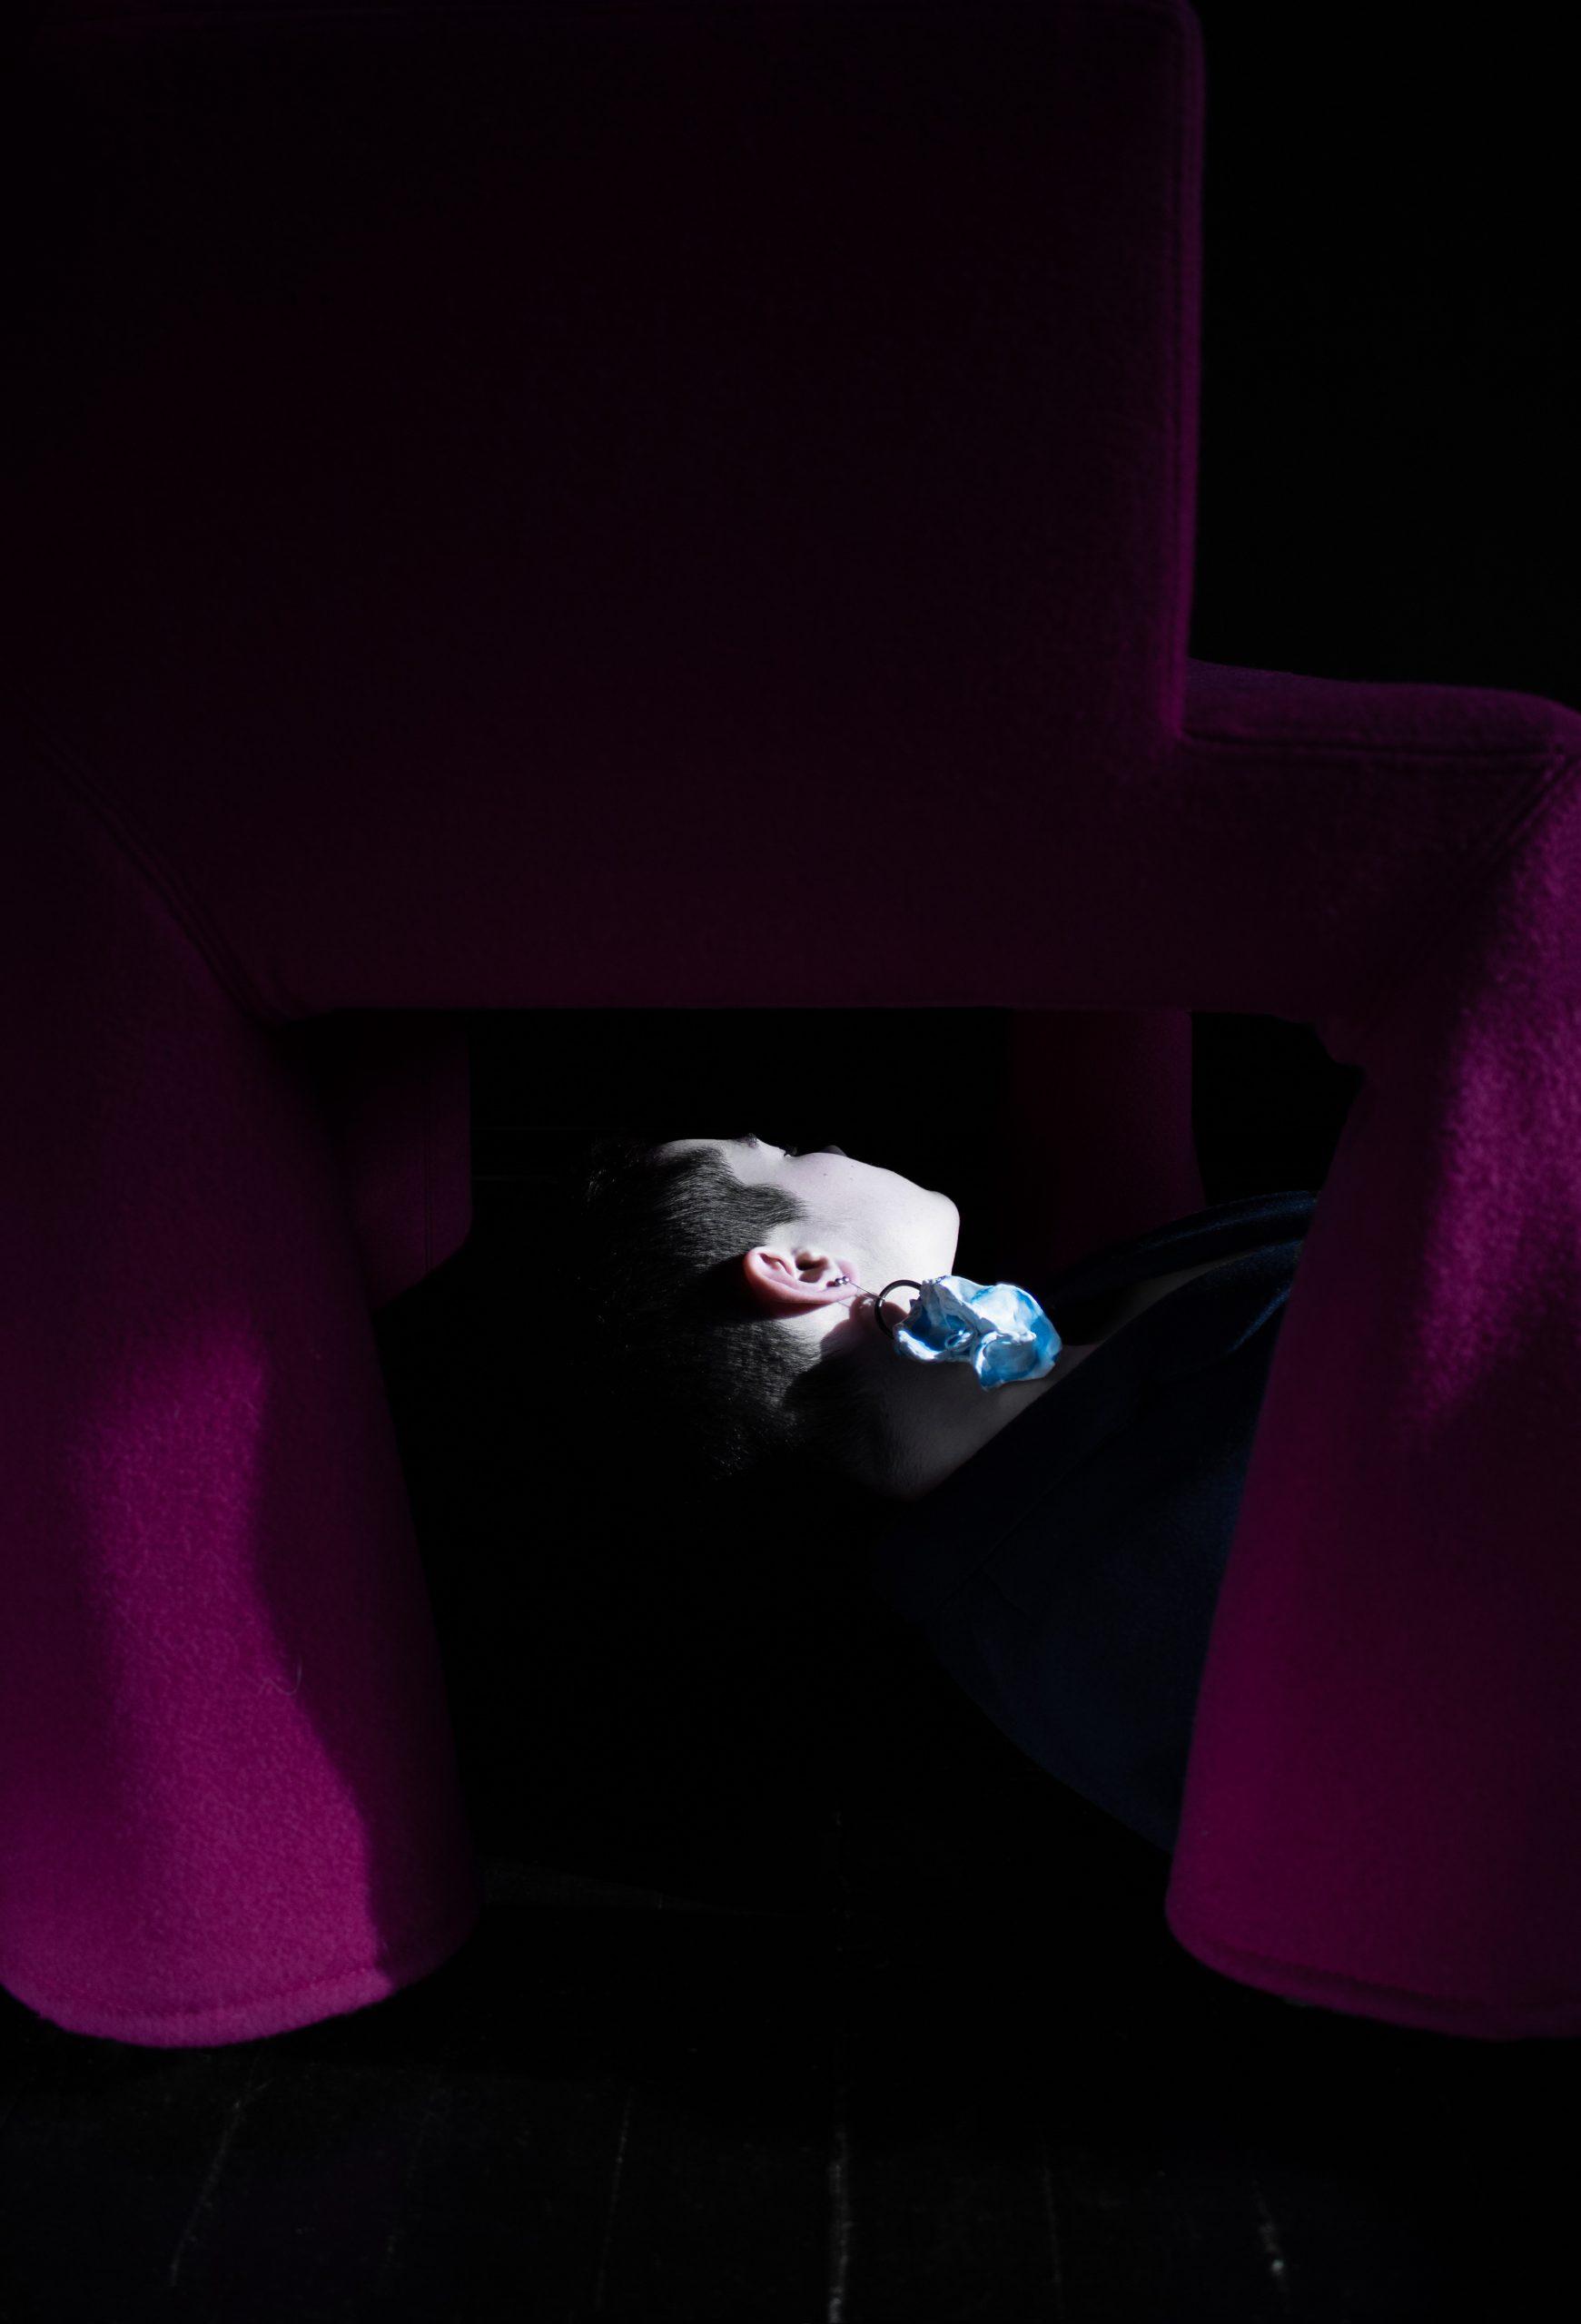 flexible tongue beautiful woman blue sculpture earrings portrait photography